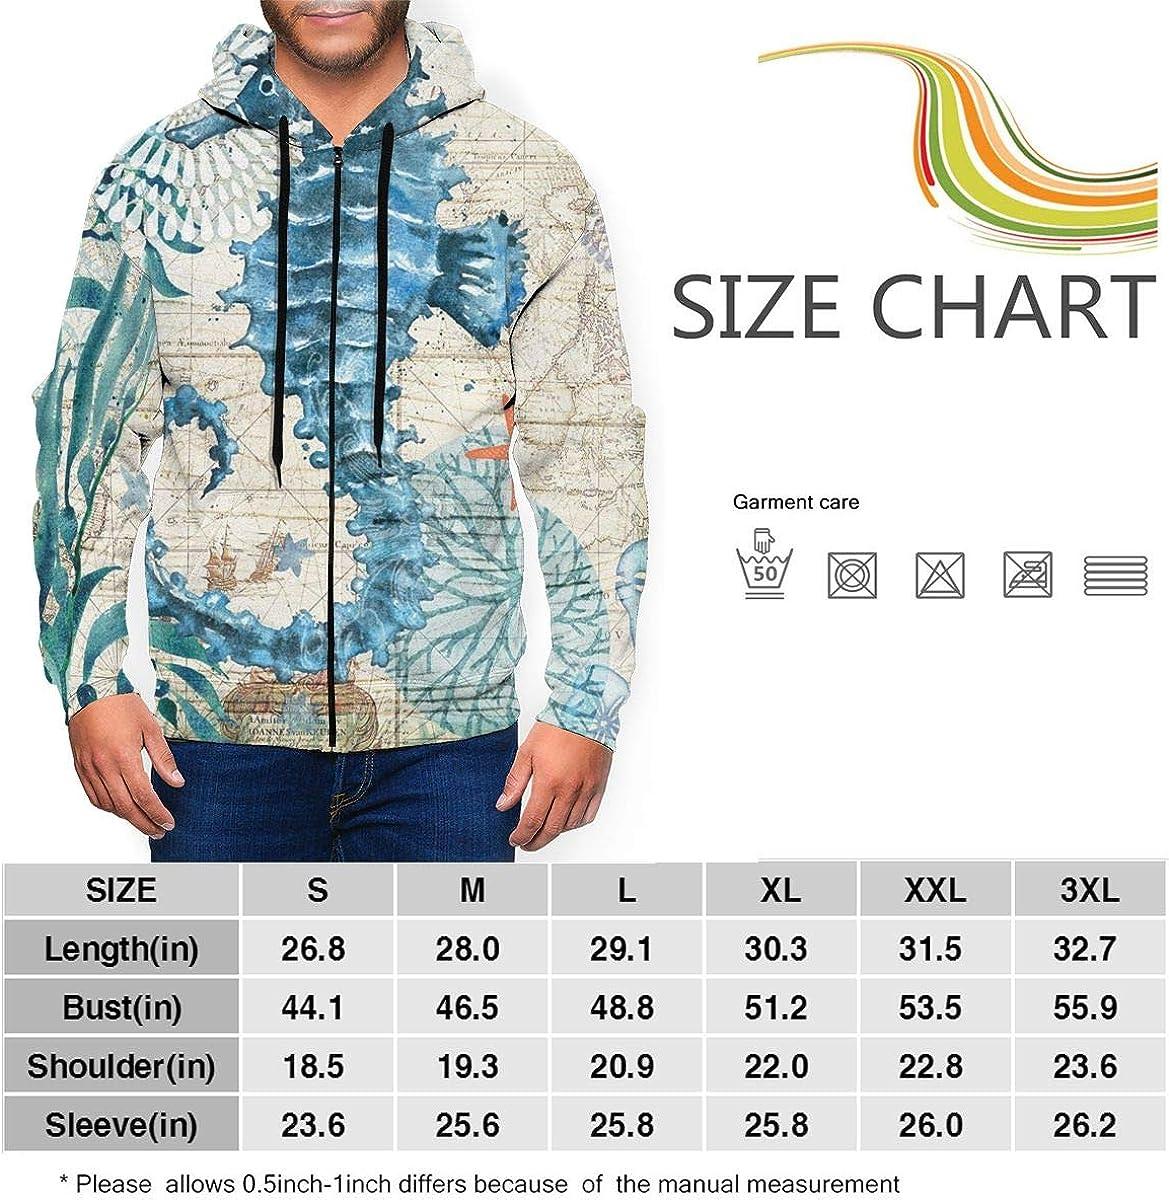 Seahorse Wild Zip-up Sweatshirt Hoodie Kangaroo Pocket for Mans